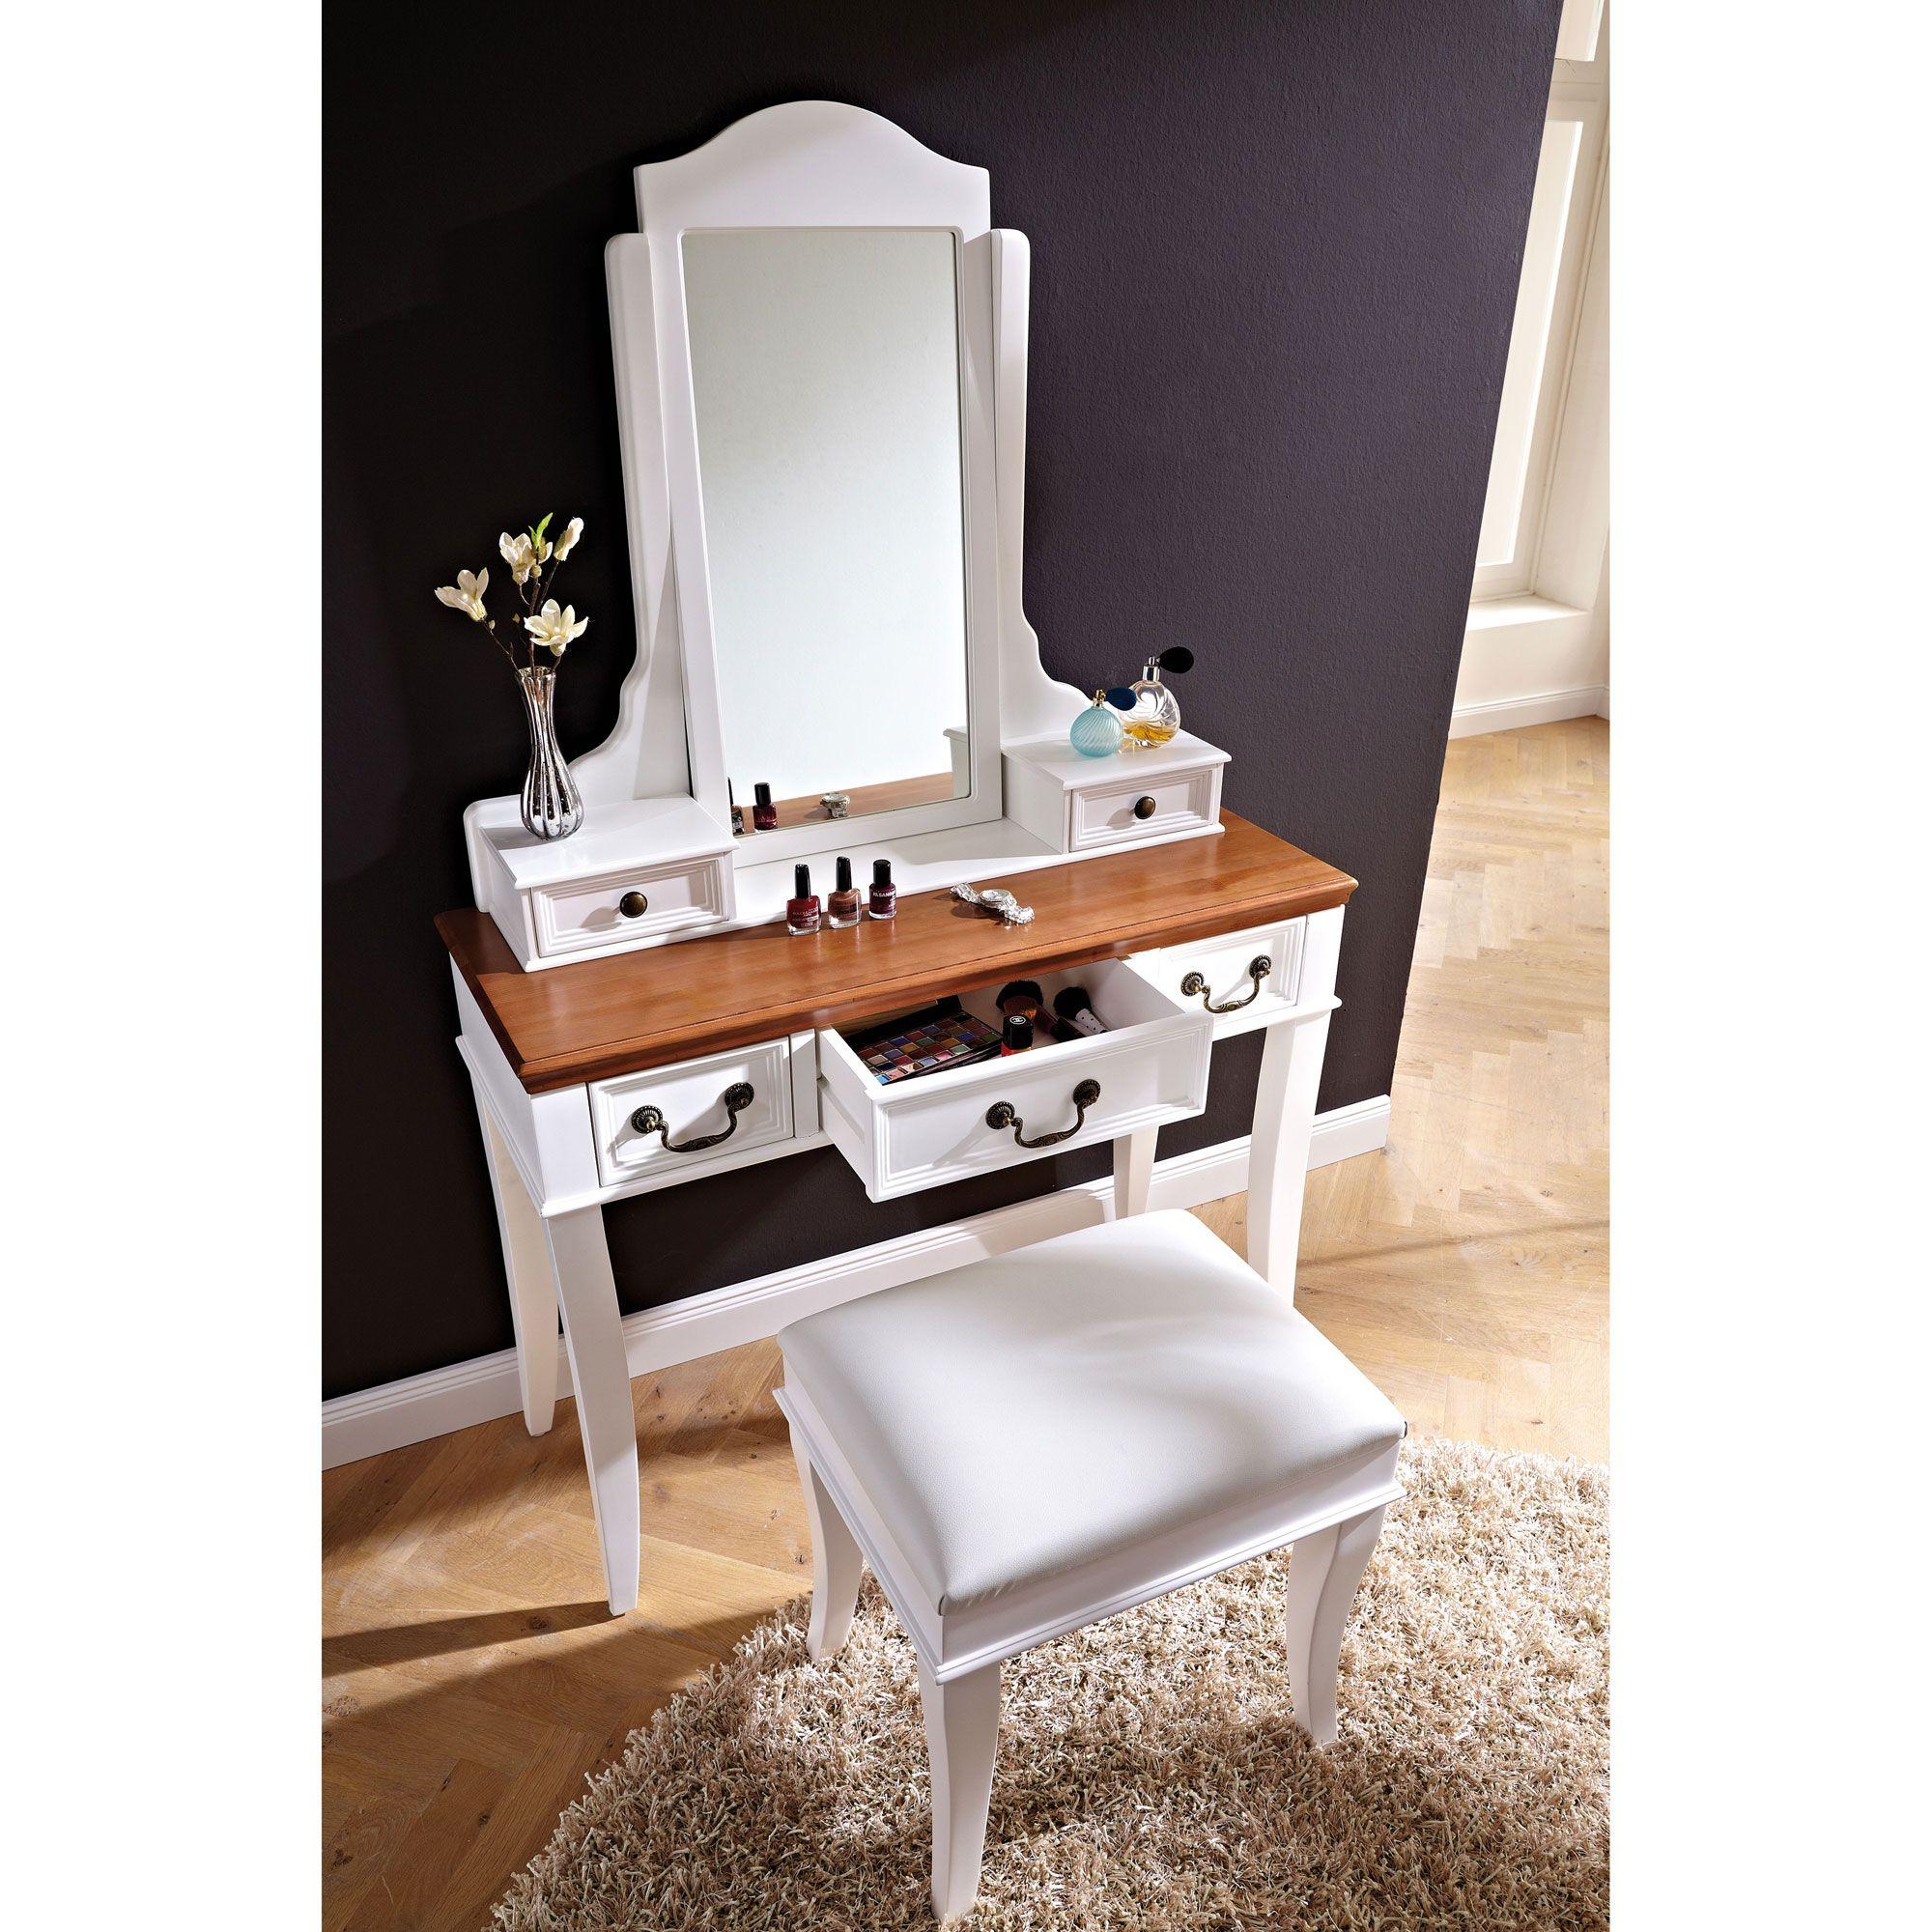 Coiffeuse bois miroir inclinable tabouret j for Coquetas muebles dormitorio